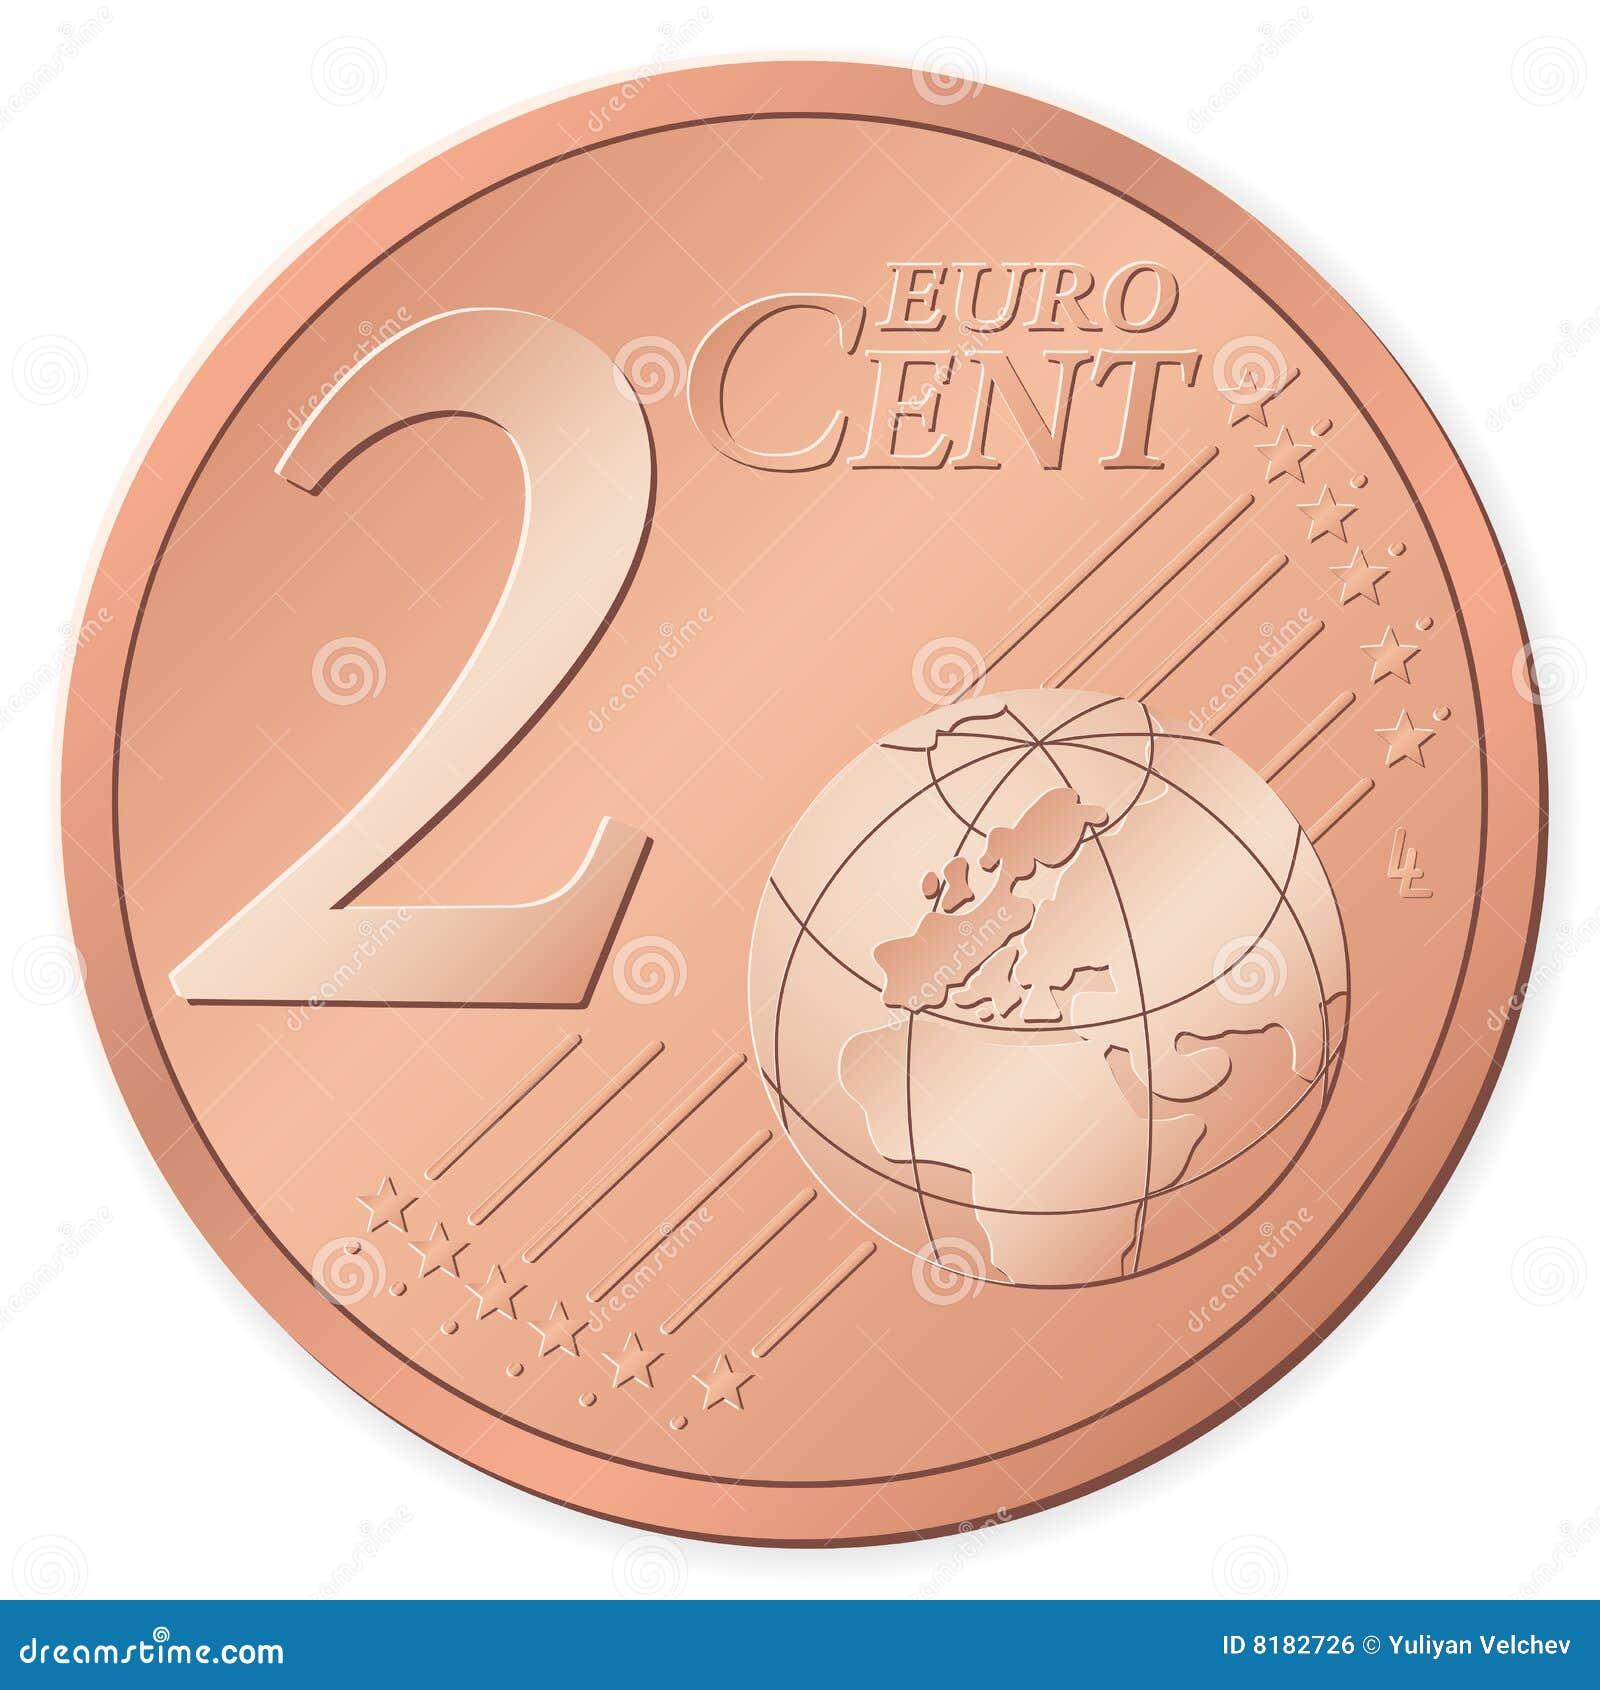 Euro cent 2